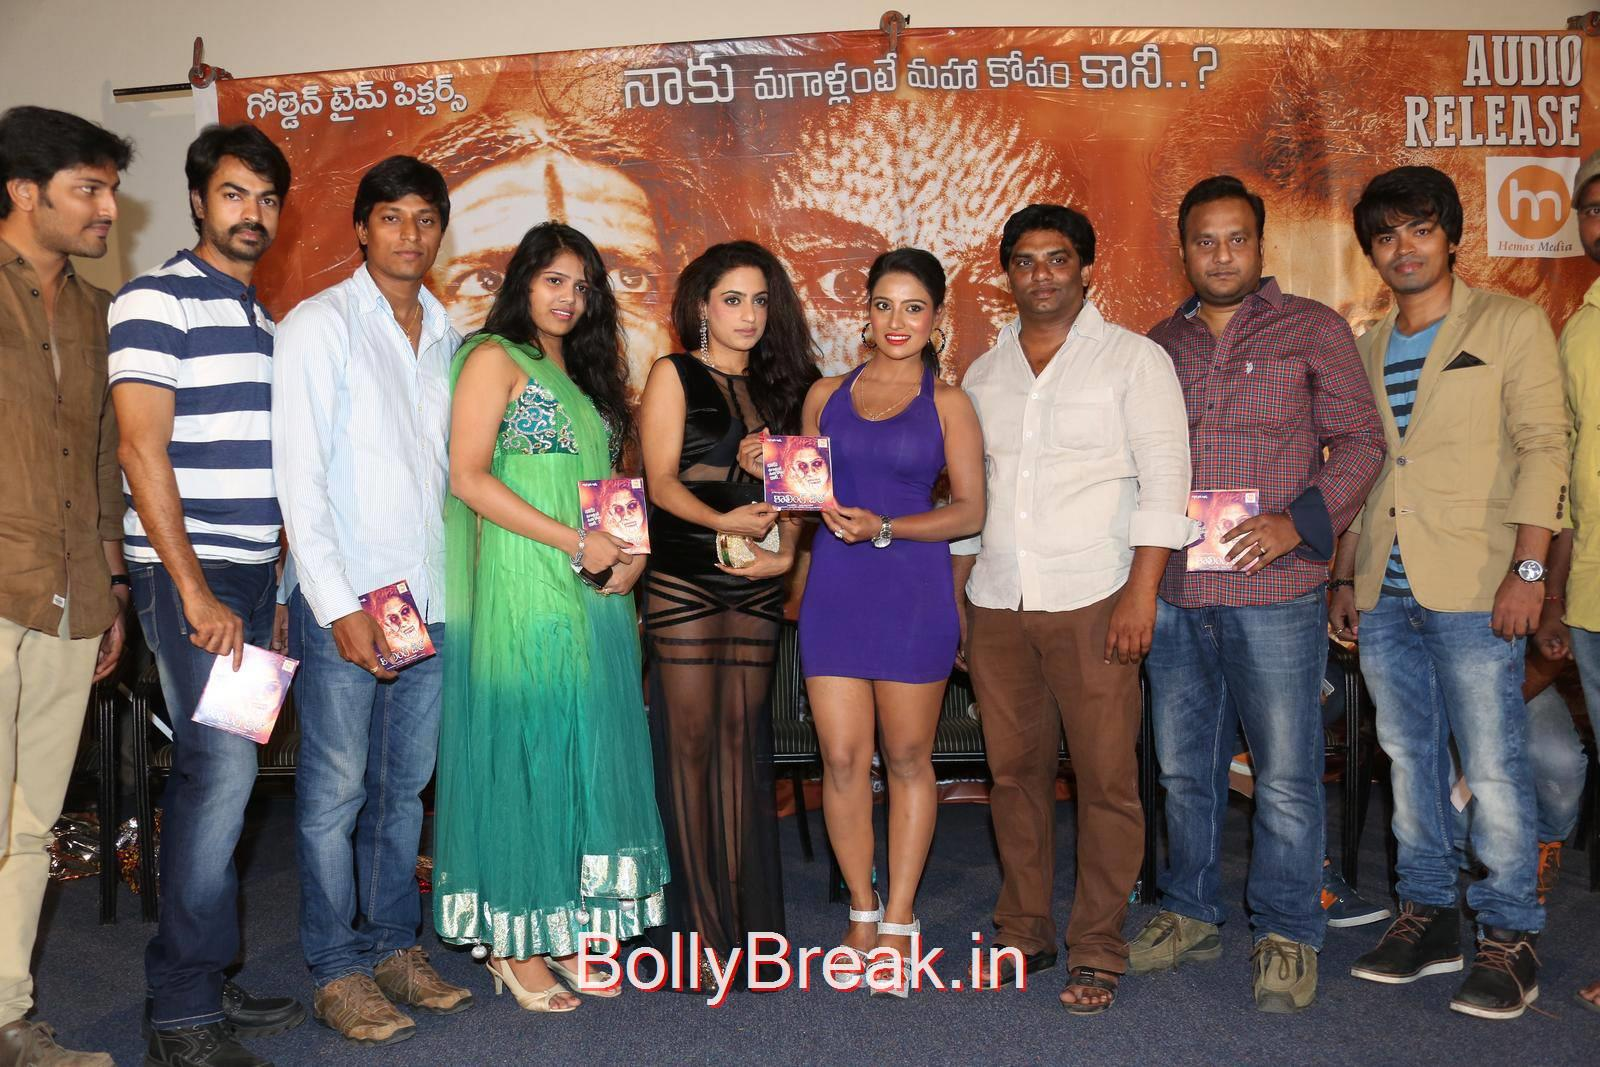 Ravi Varma-Calling Bell Cinema Audio Launch Stills, Lucky, Vriti Khanna,Mamatha Rahuth Hot Pics From Calling Bell Movie Audio Launch